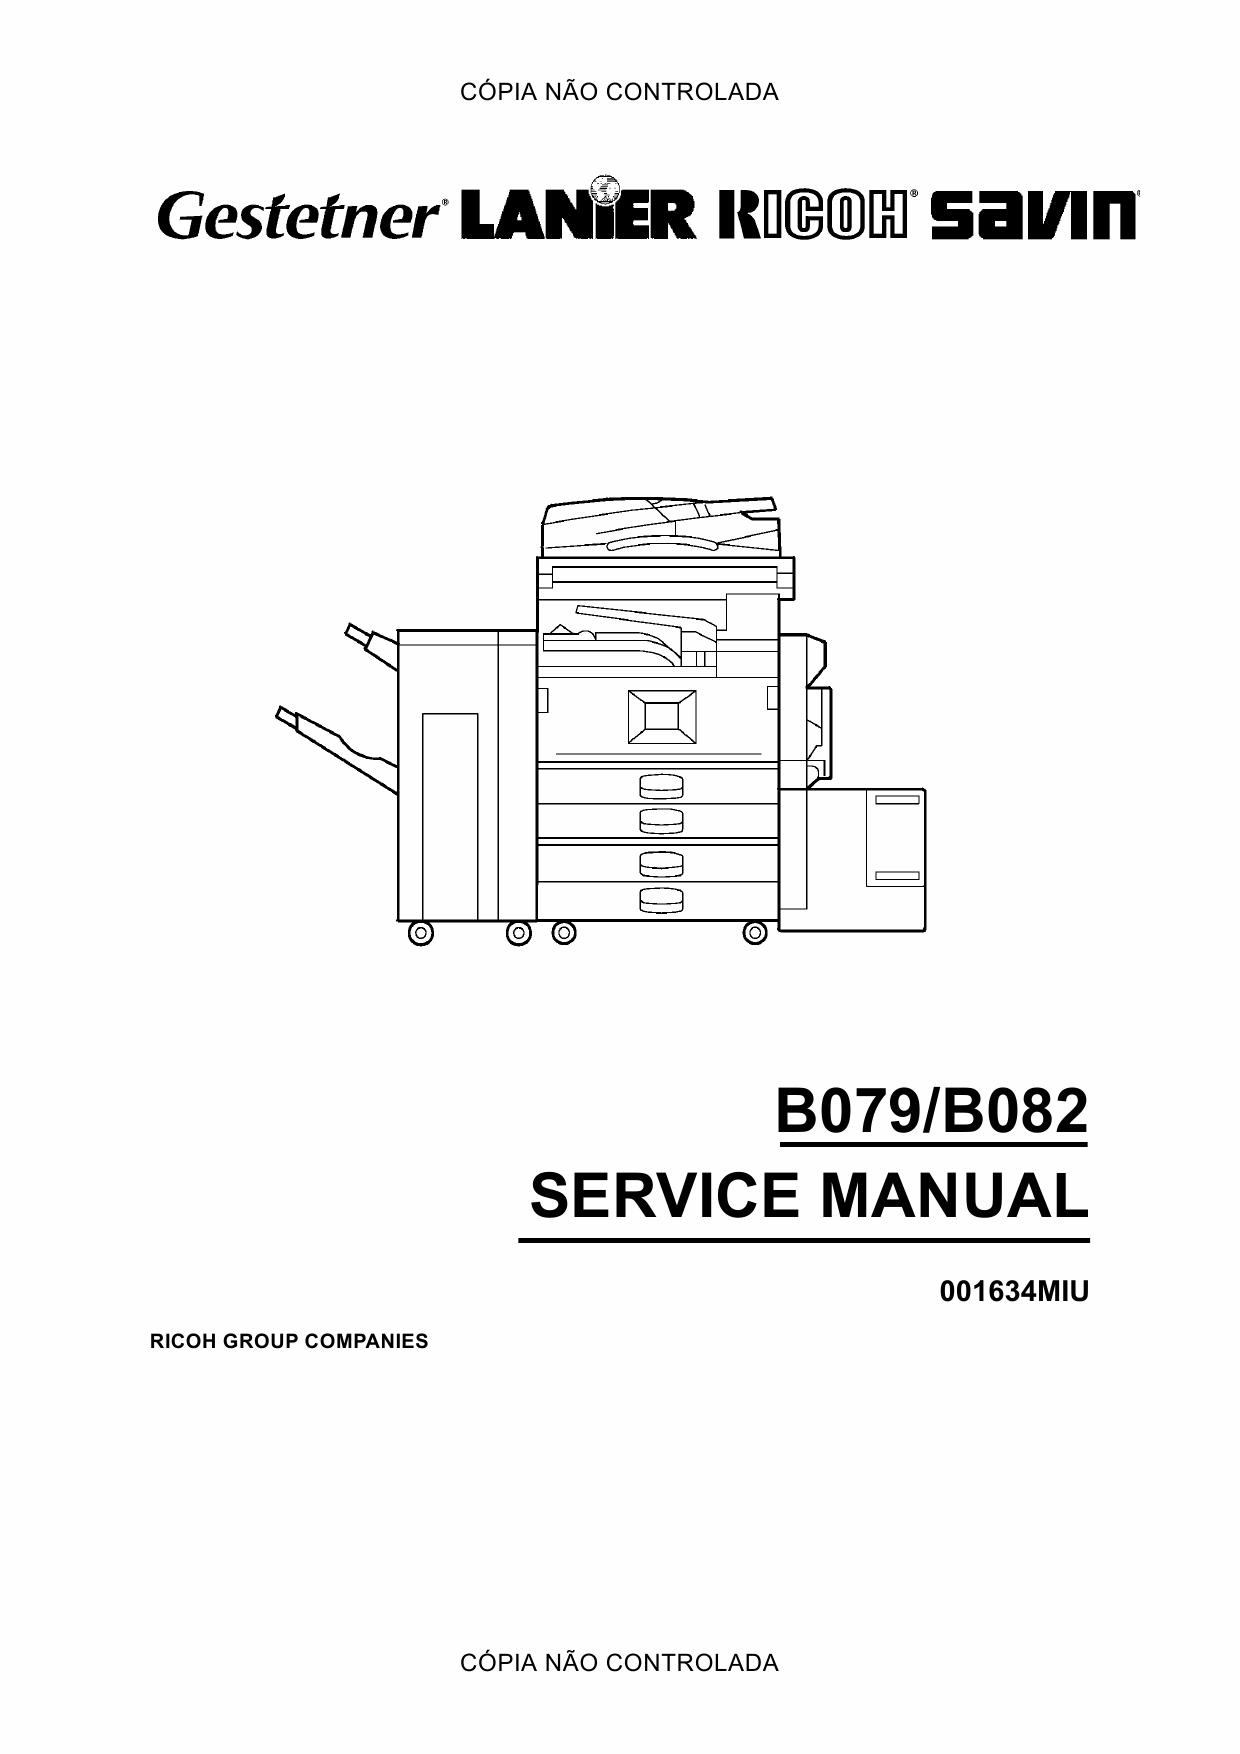 ricoh aficio 2035 2045 b079 b082 service manual ricoh aficio 2035 manual ricoh aficio 2035e driver